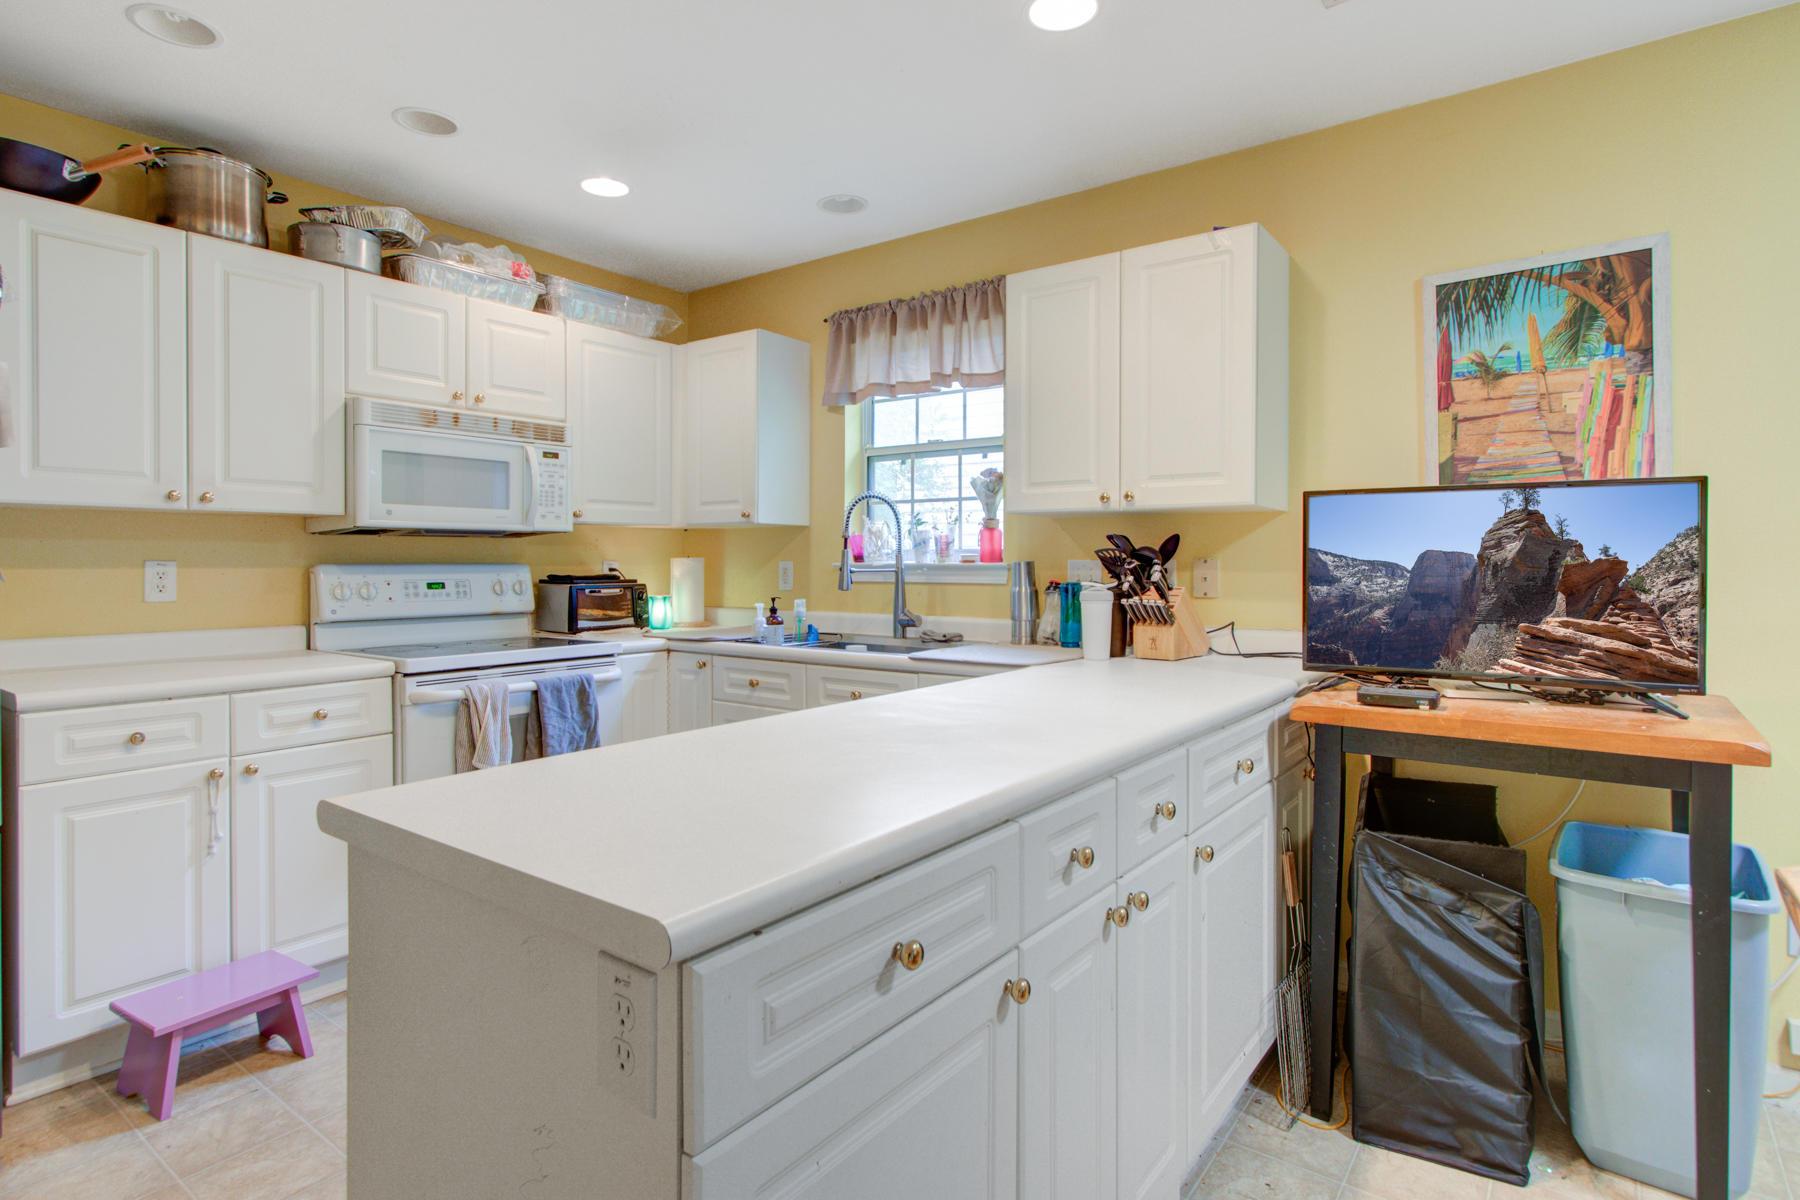 Dunes West Homes For Sale - 2232 Kings Gate, Mount Pleasant, SC - 29